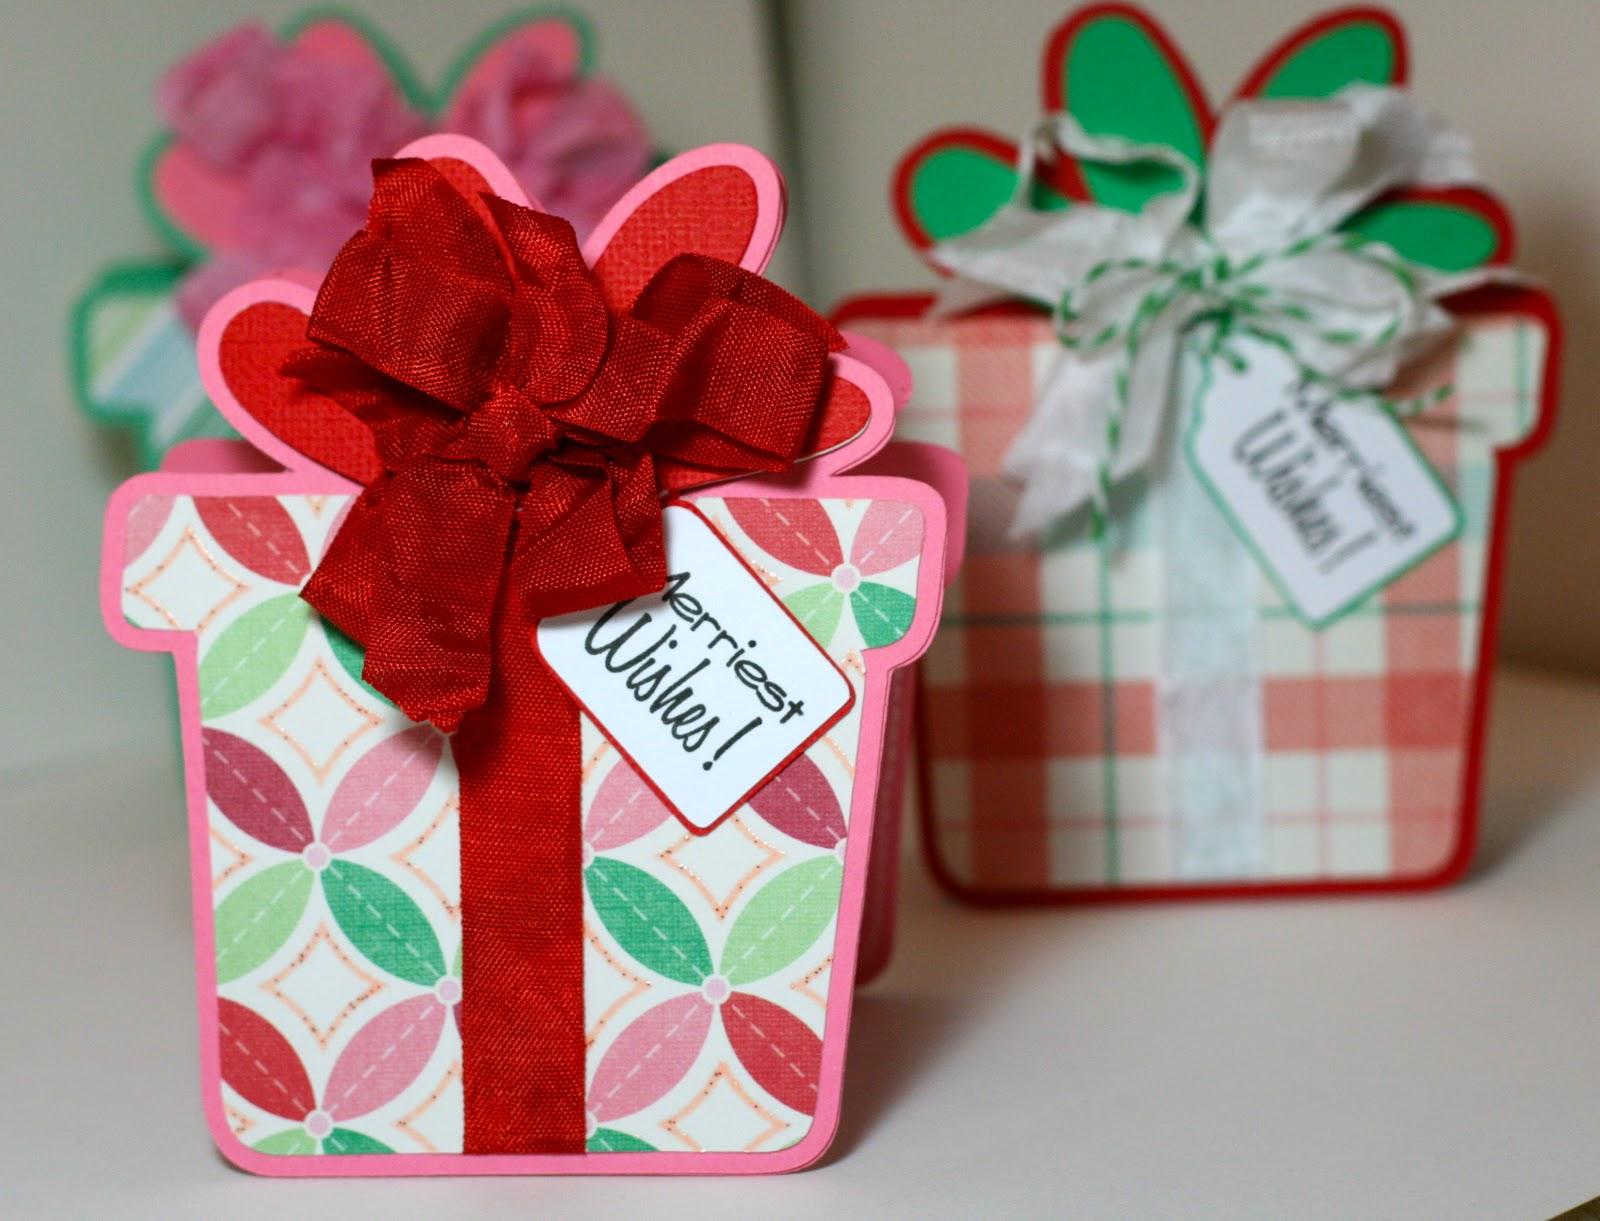 Wonderful Cricut Christmas Crafts Part - 13: Monday, December 12, 2011